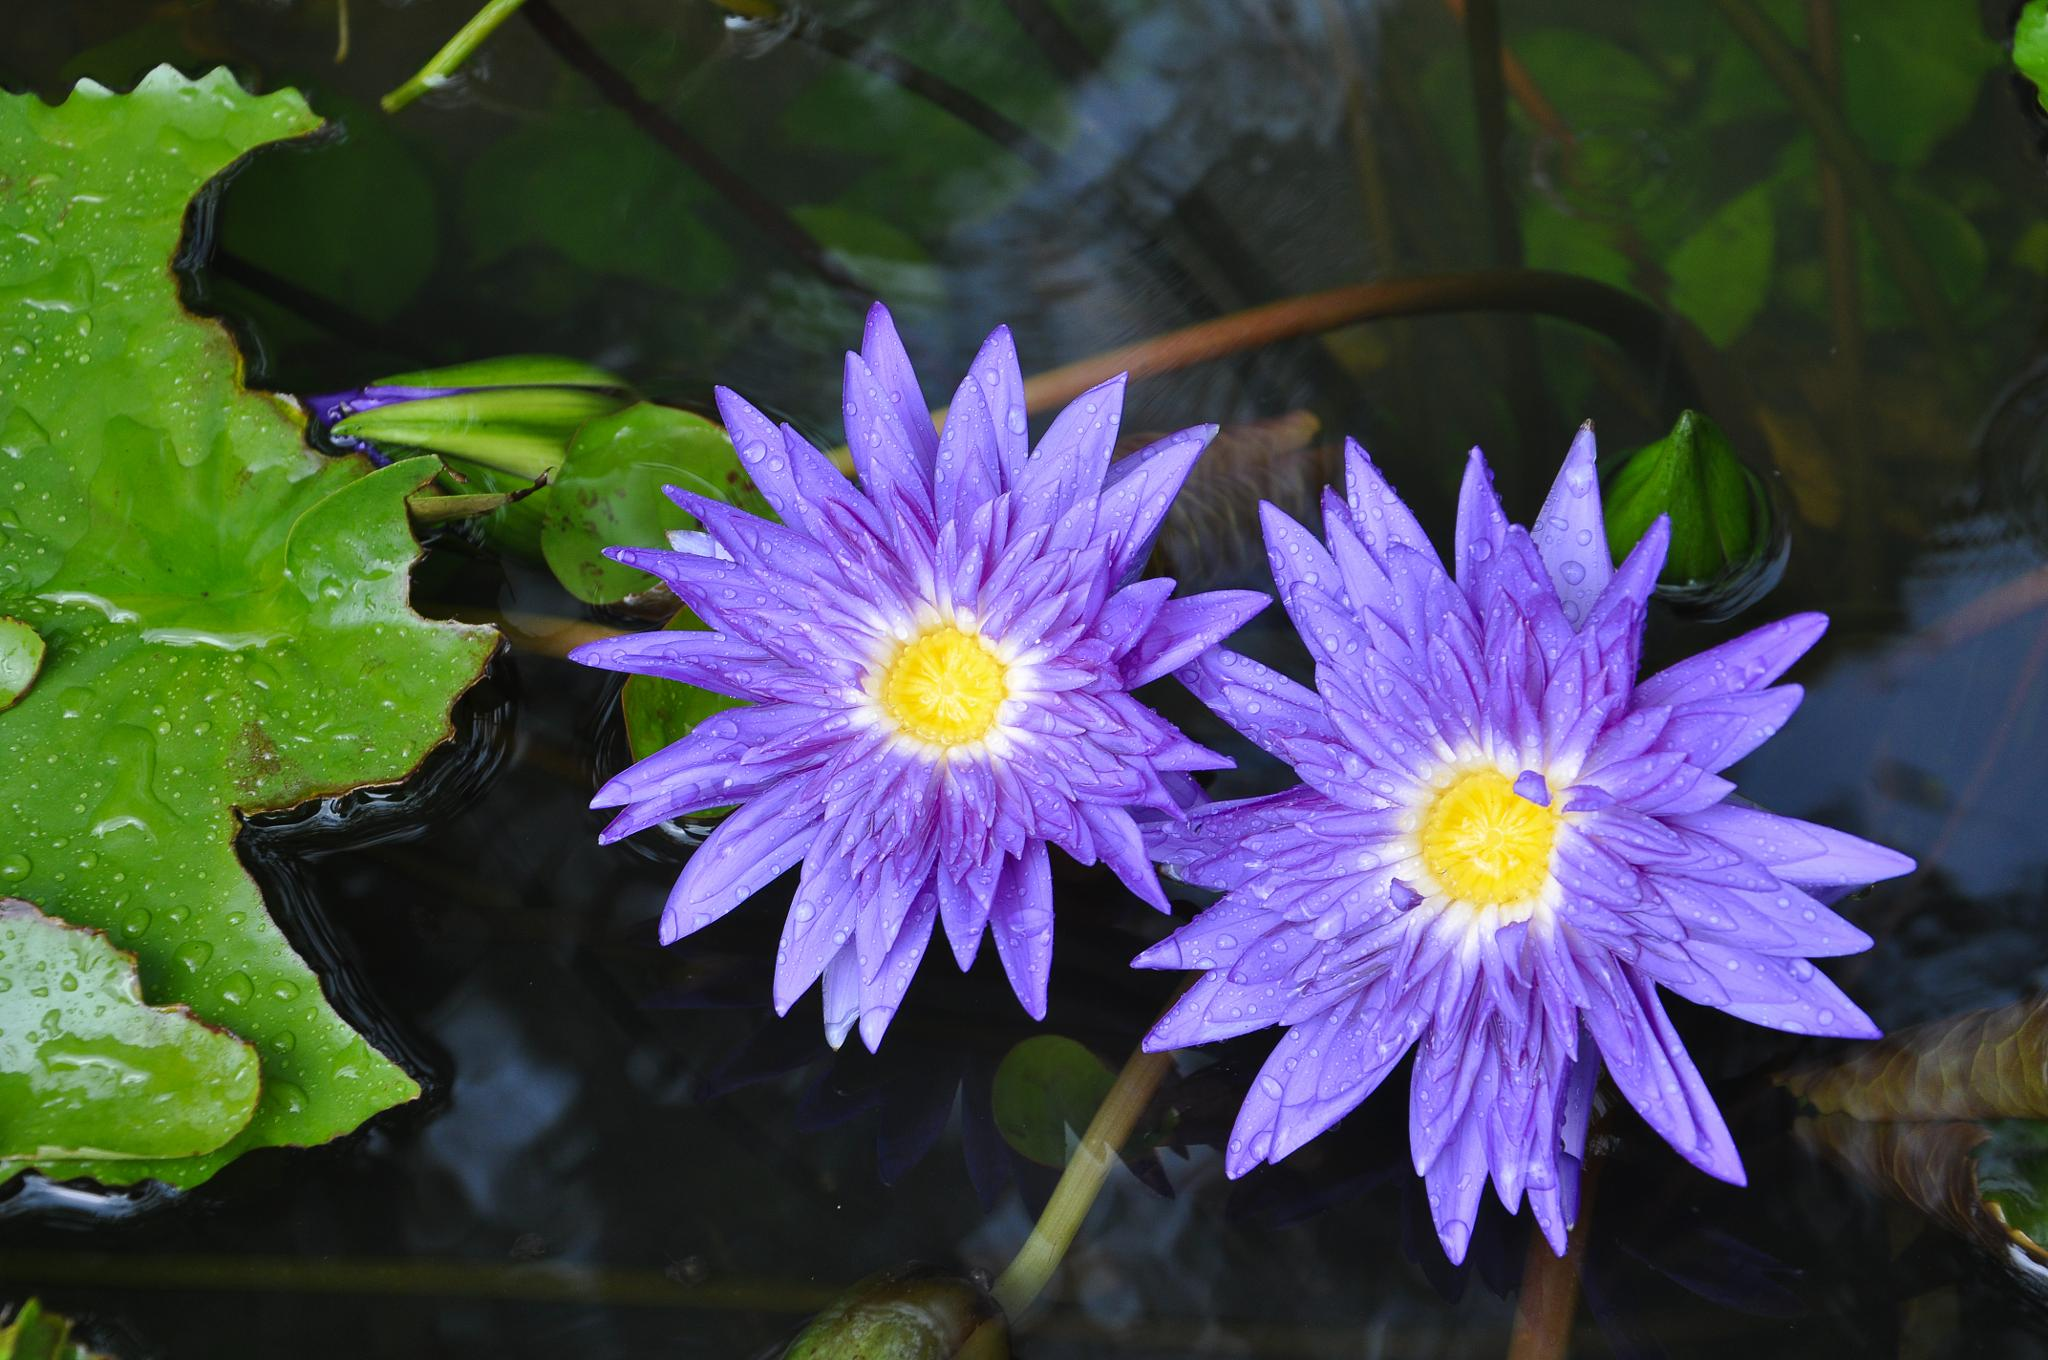 Phuket flowers by Anna Pronenko